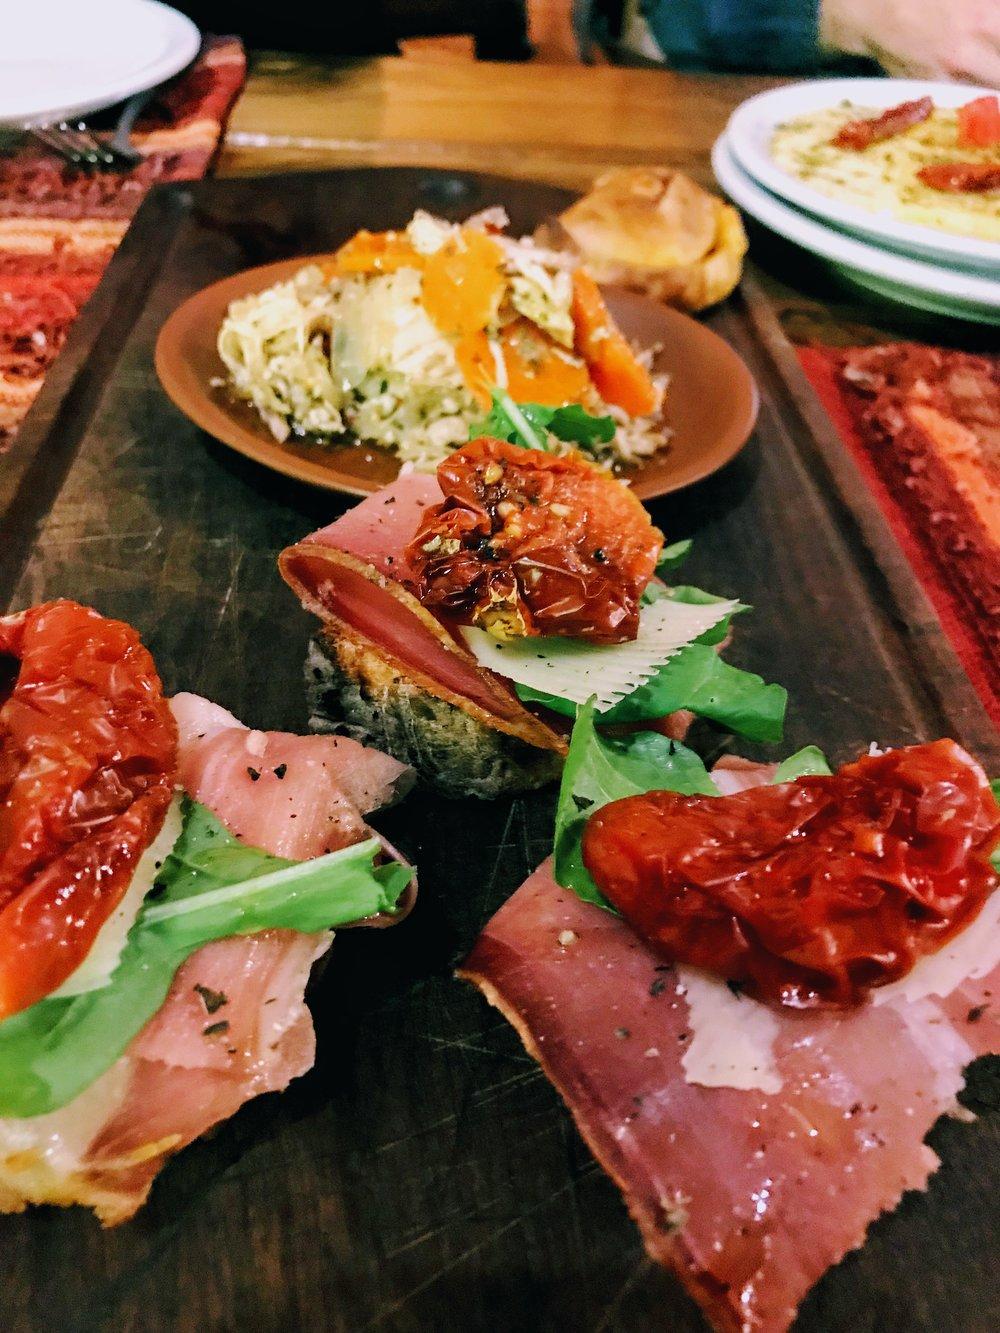 Appetizers at Casa de Campo